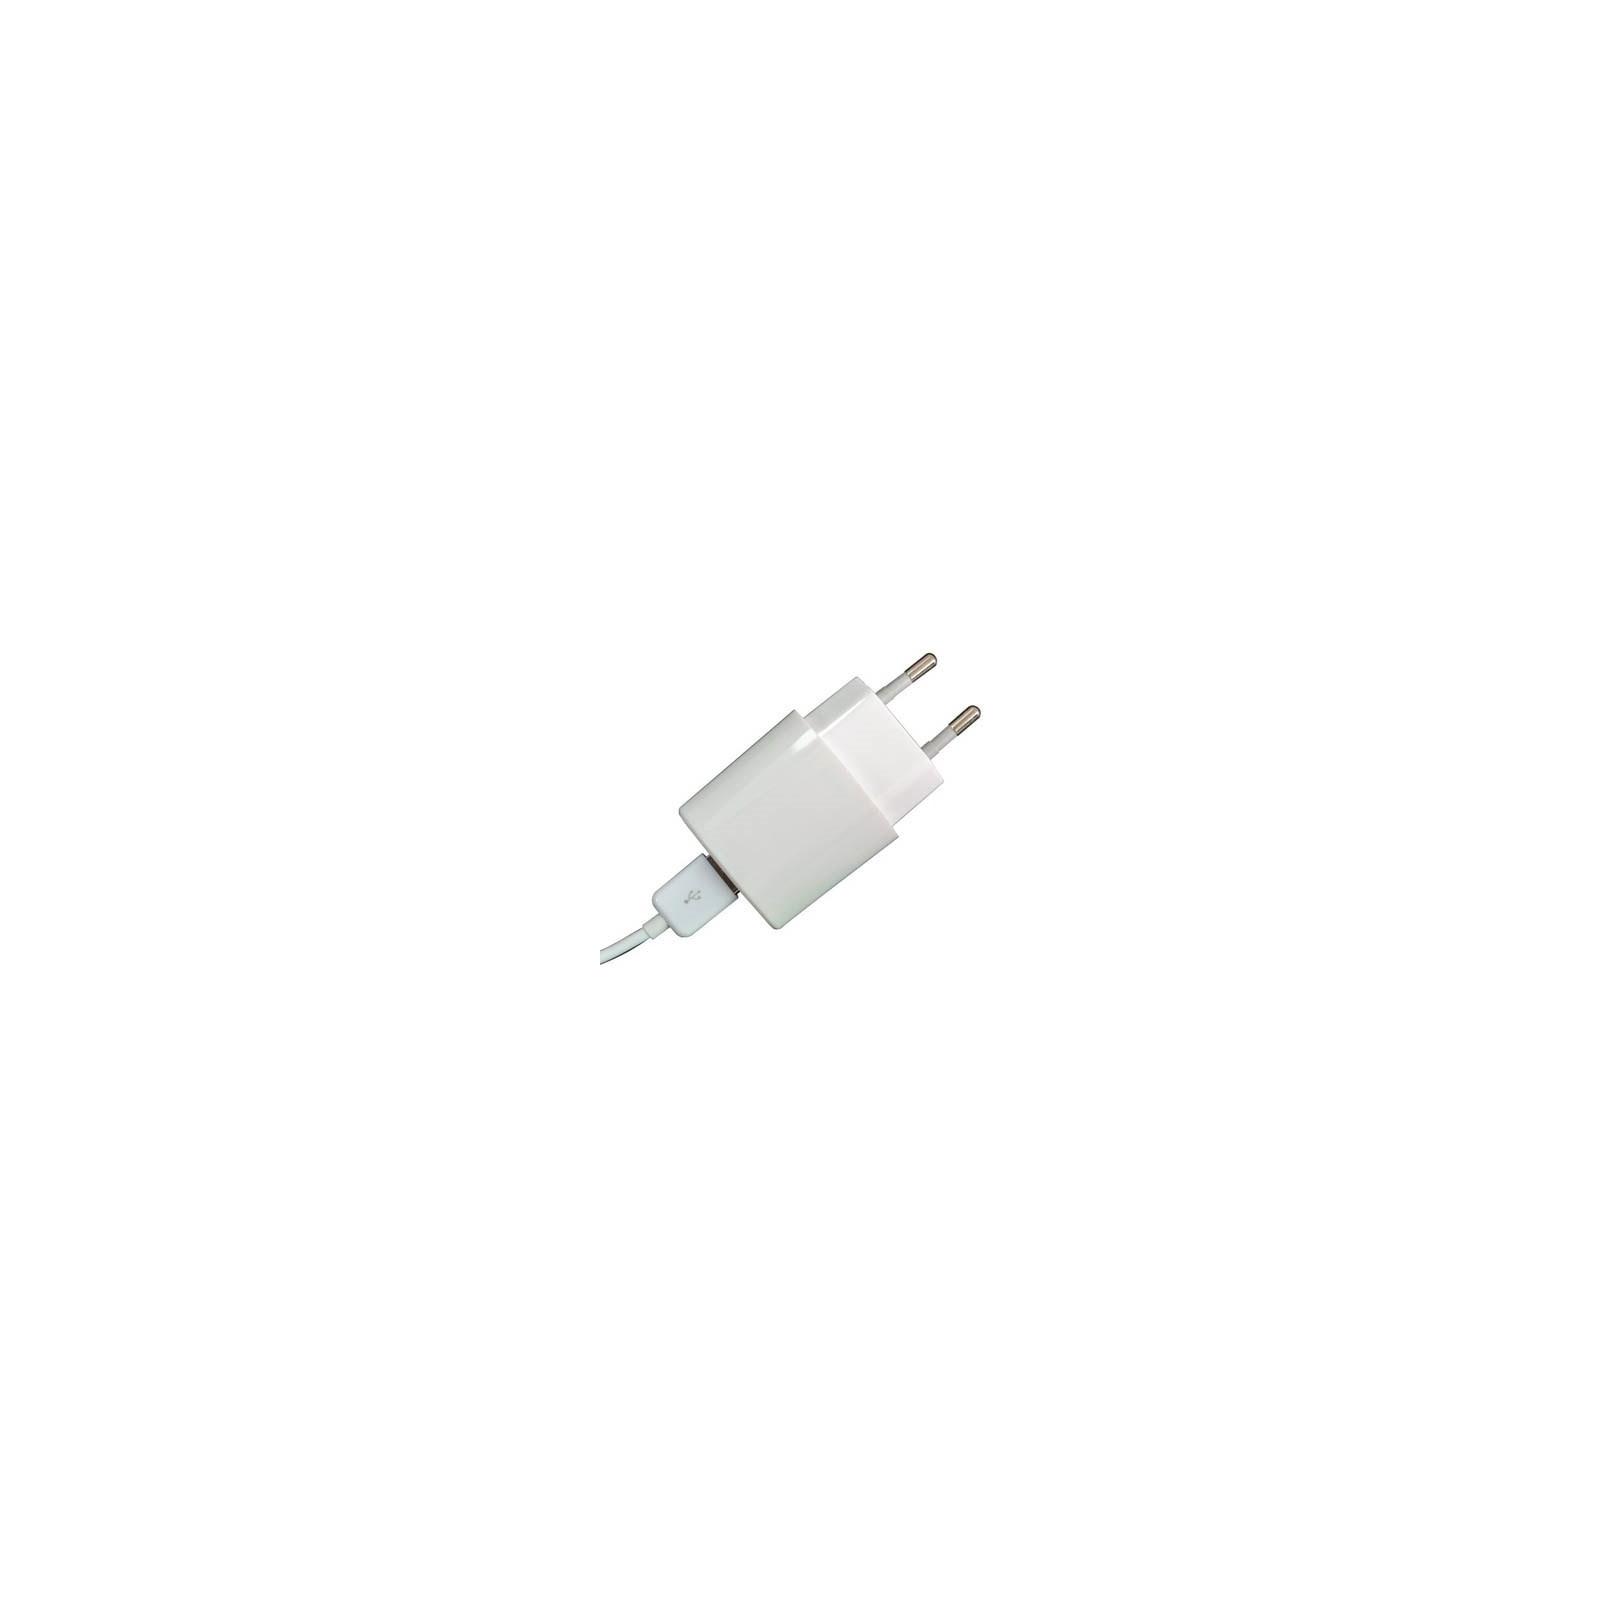 Зарядное устройство GLOBAL iPhone 4 (1283126445873)